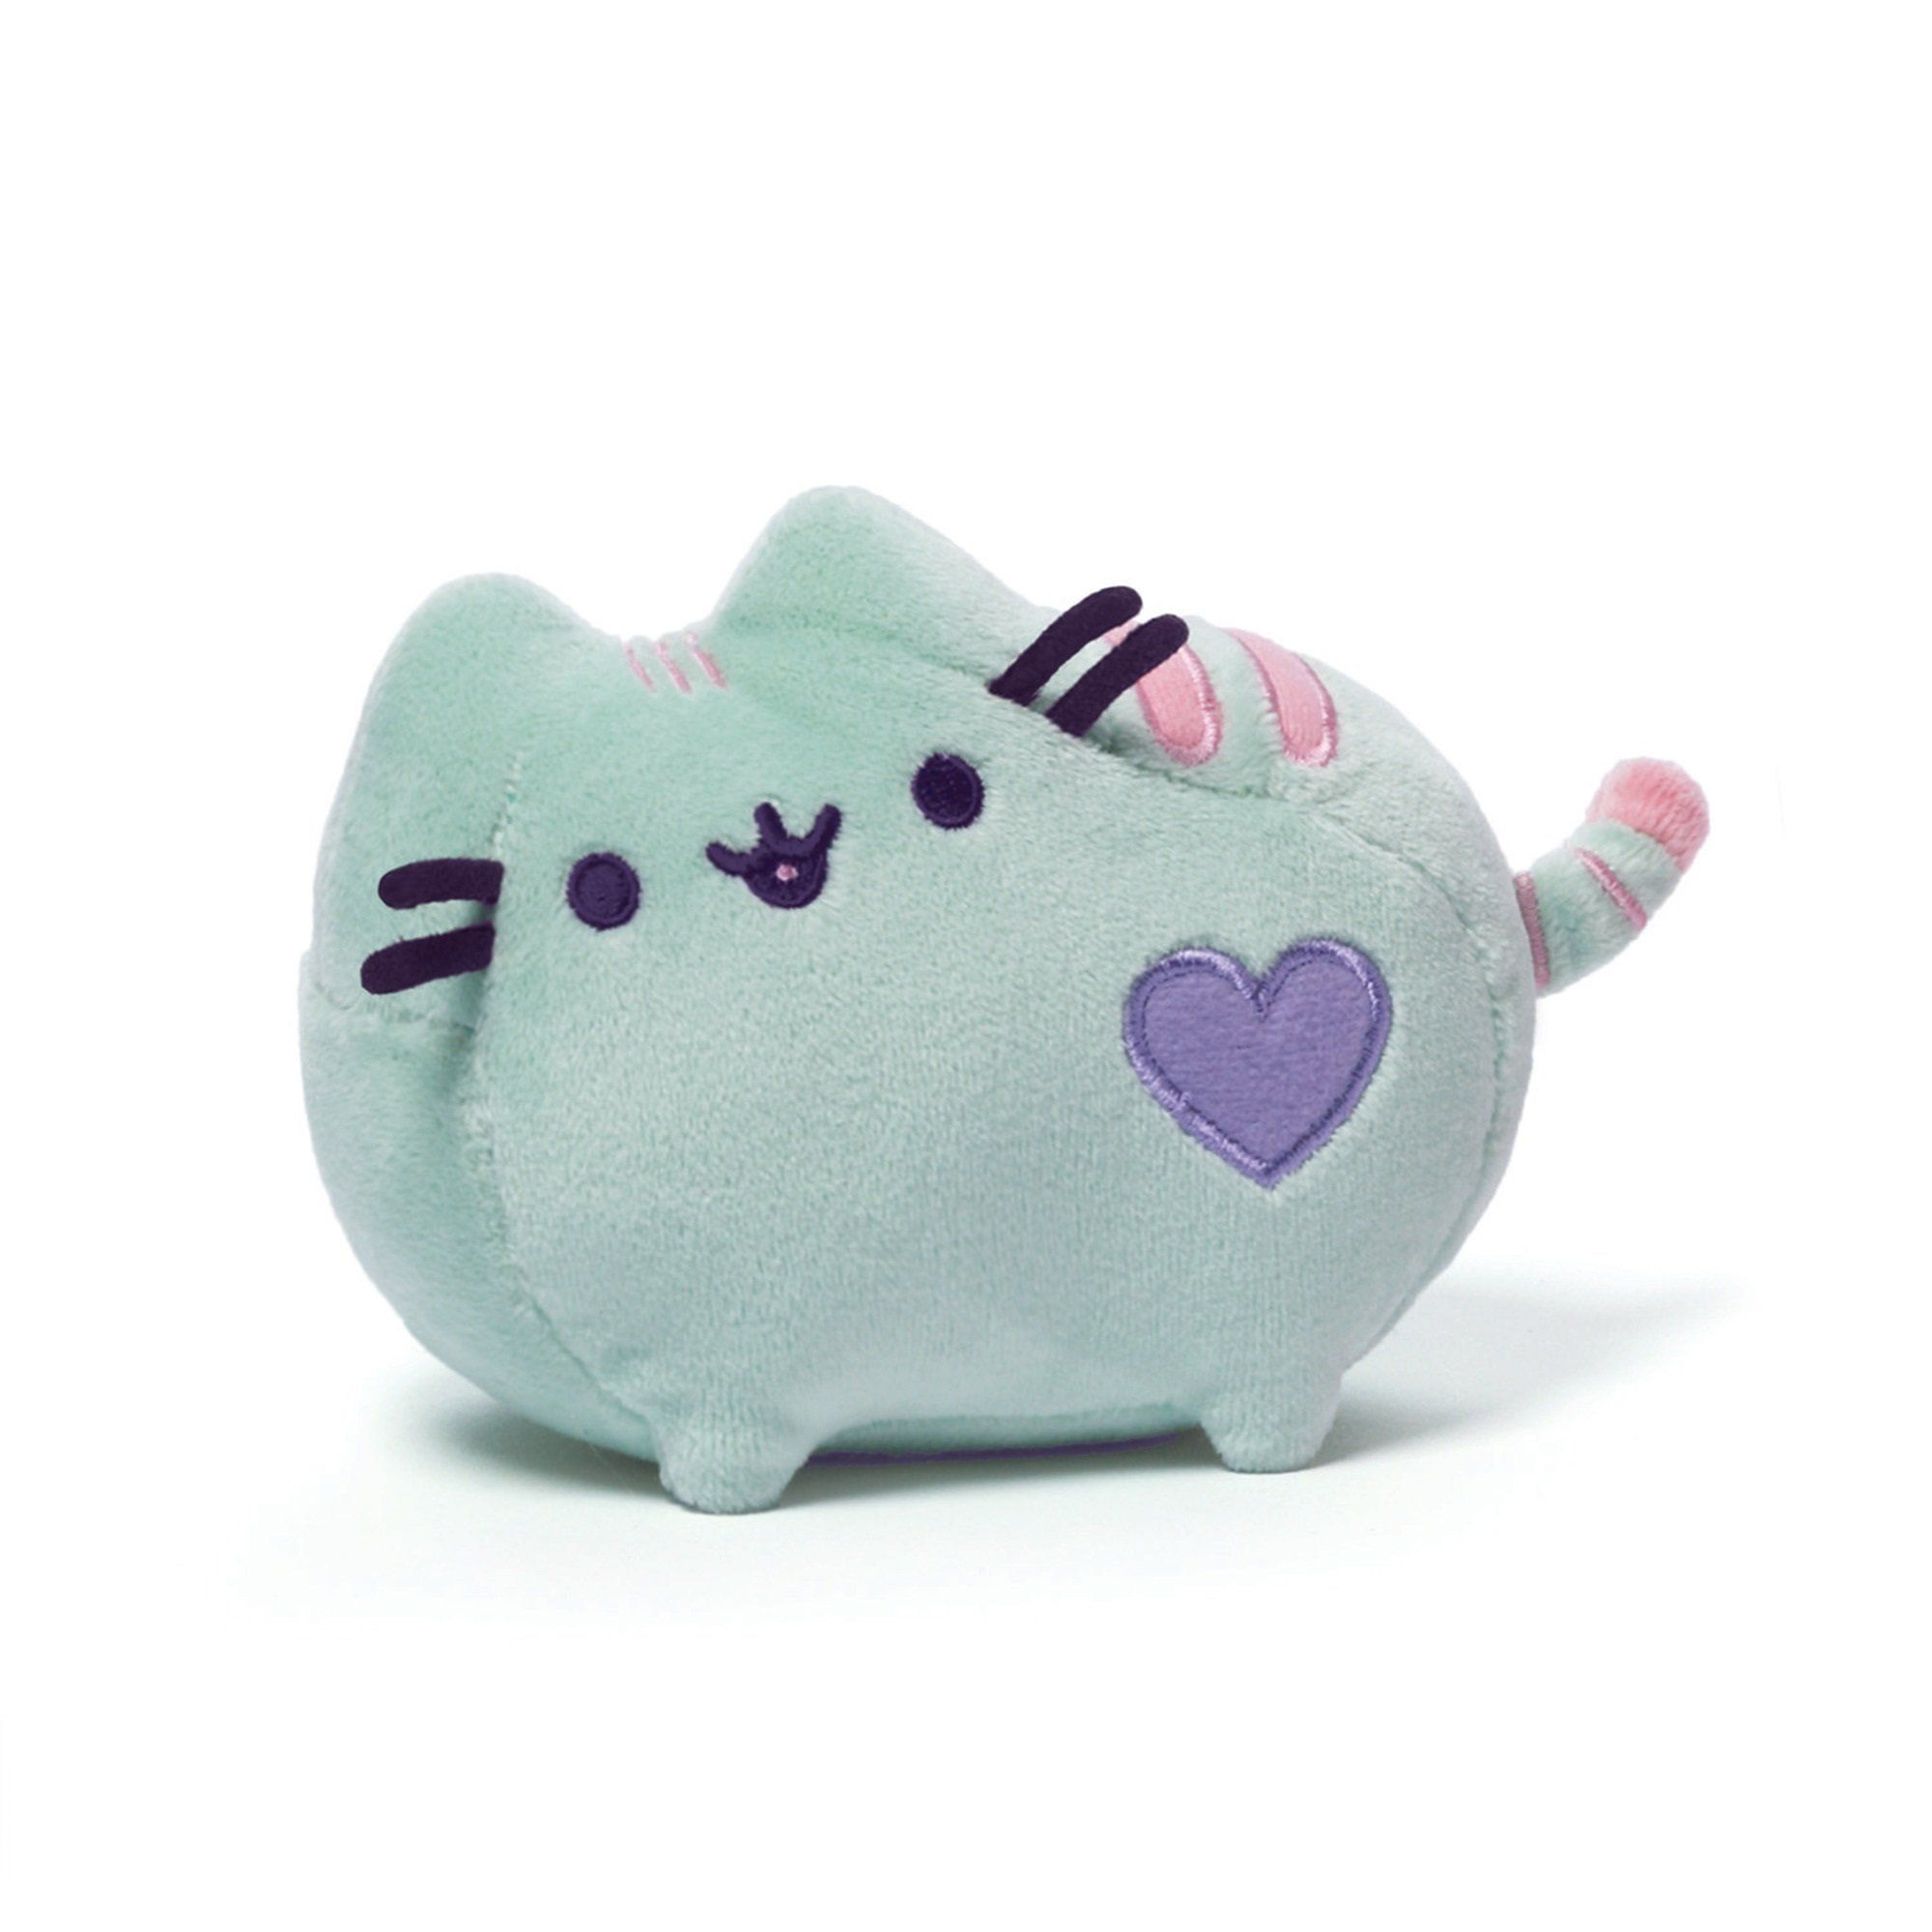 Predownload: Pusheen Pastel Green Pusheen Plush Pusheen Cat Cat Plush [ 2000 x 2000 Pixel ]